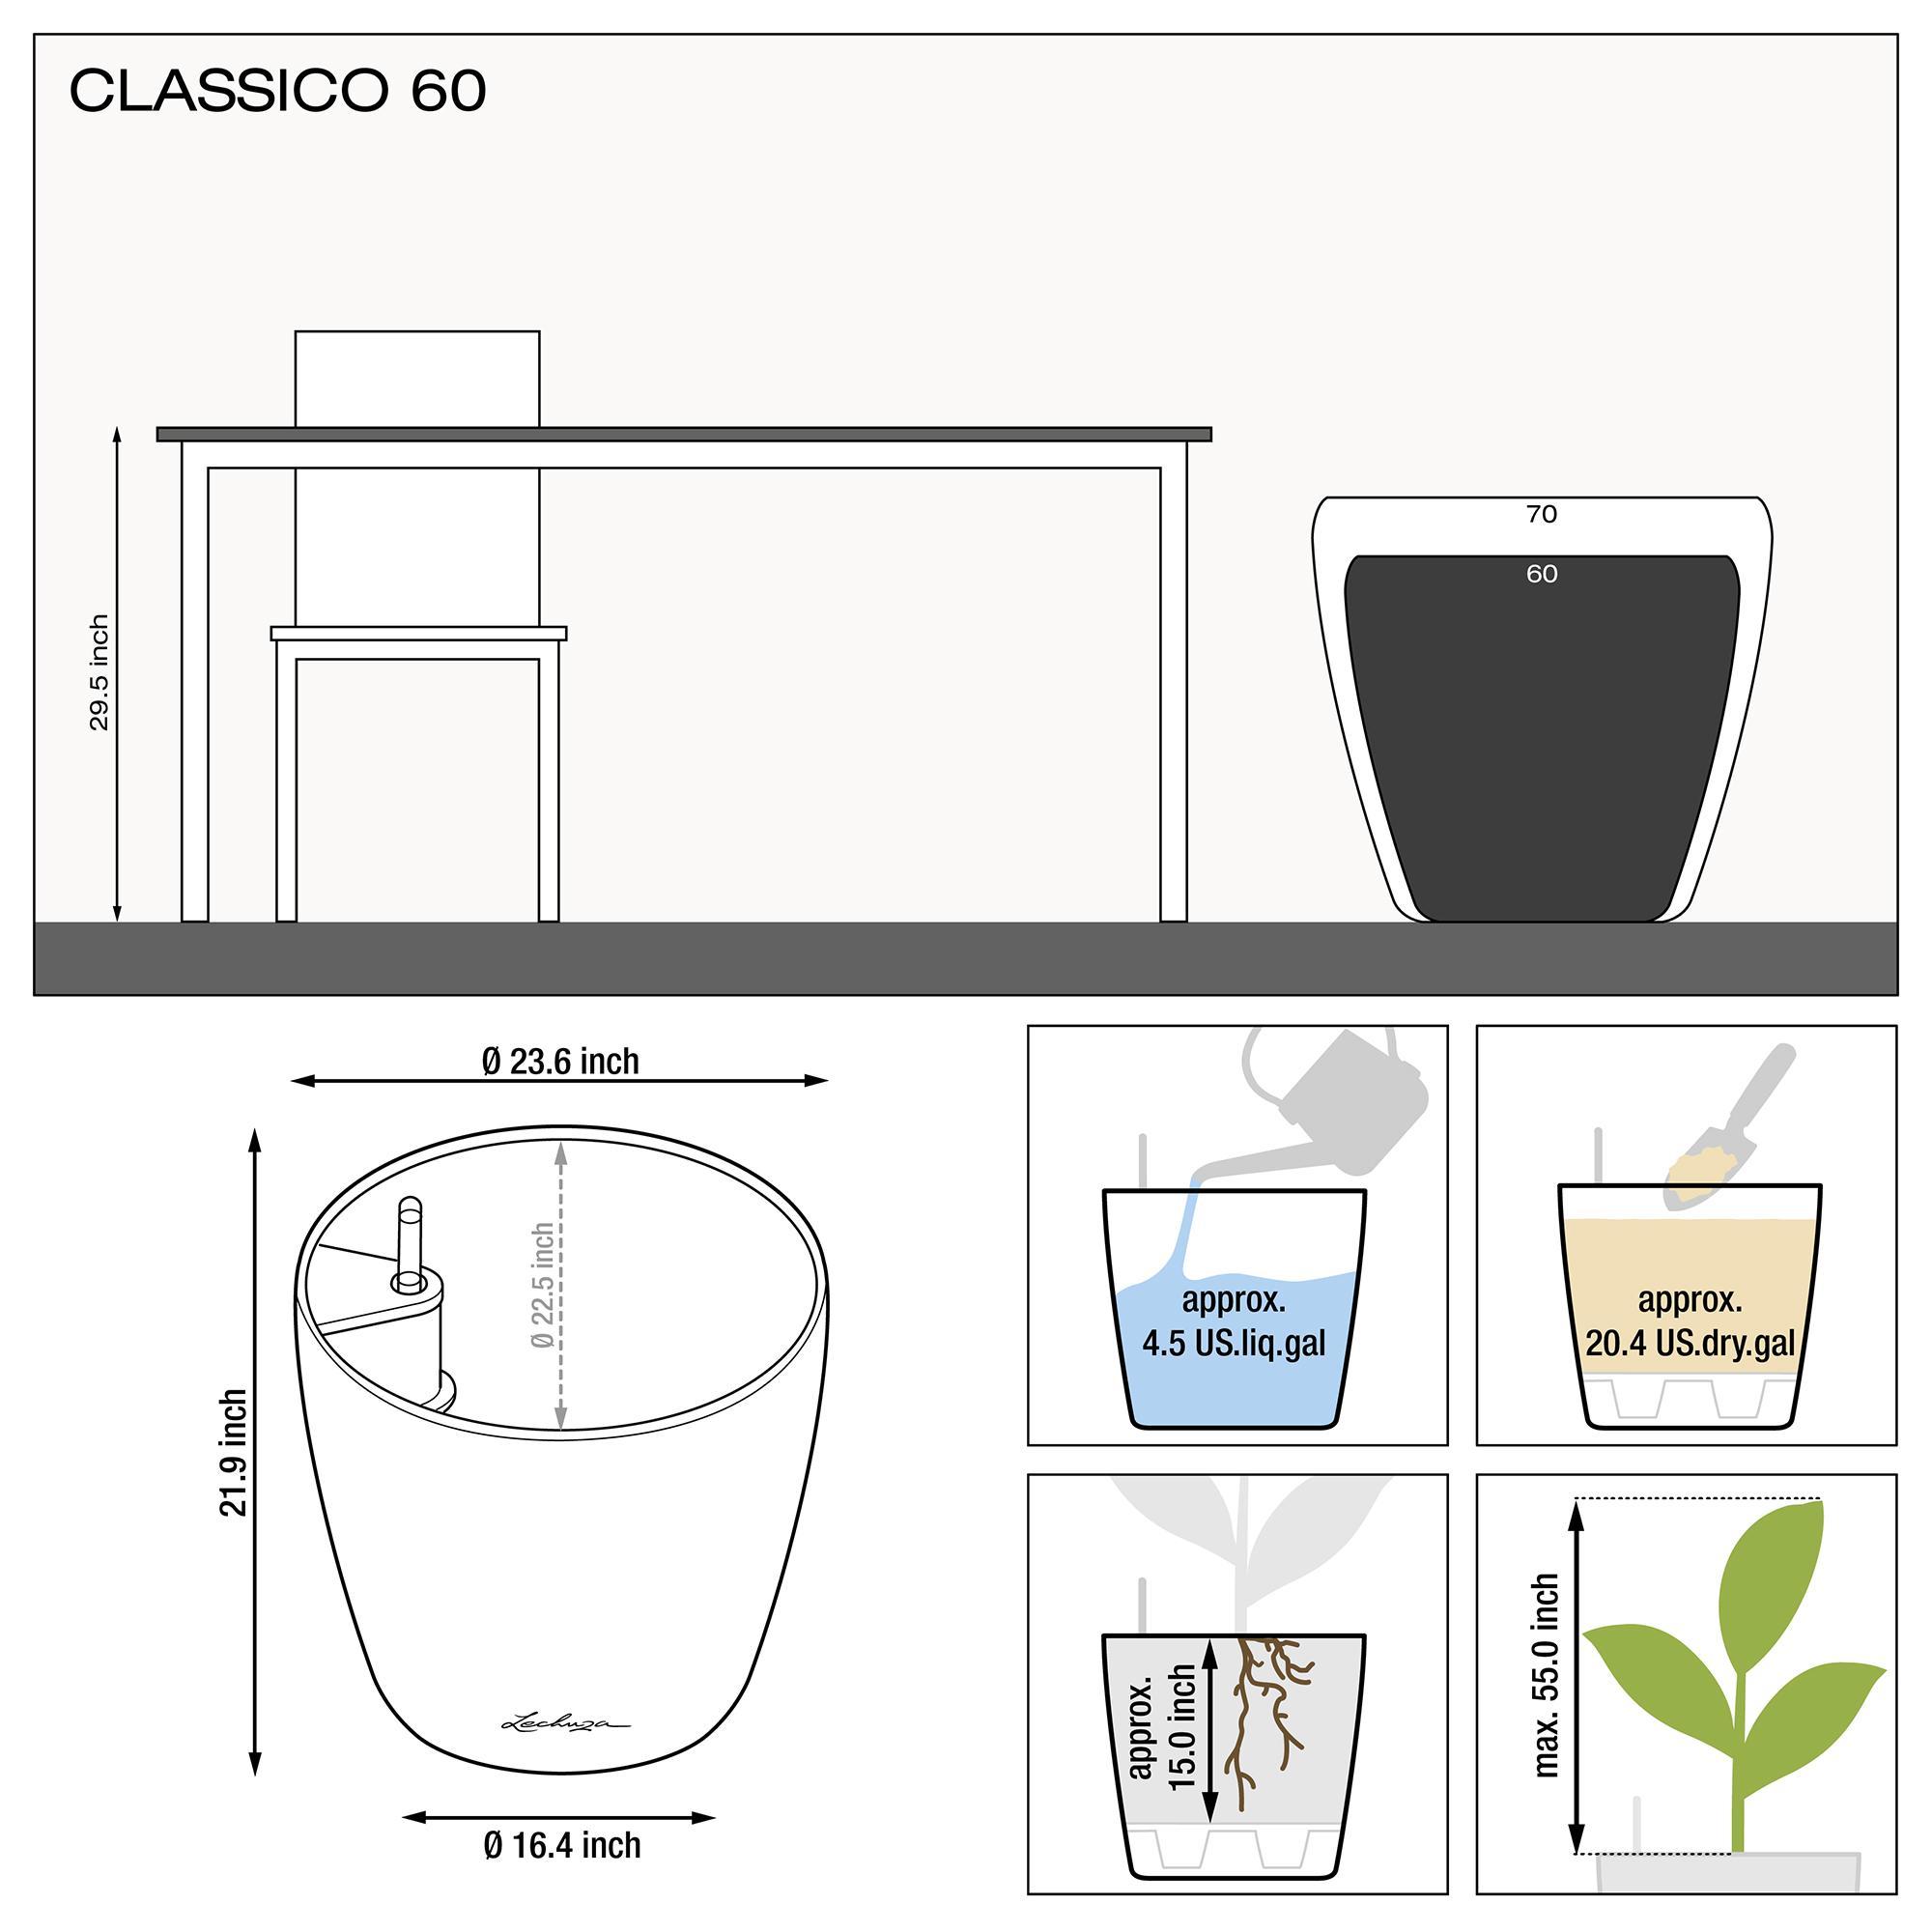 le_classico60_product_addi_nz_us